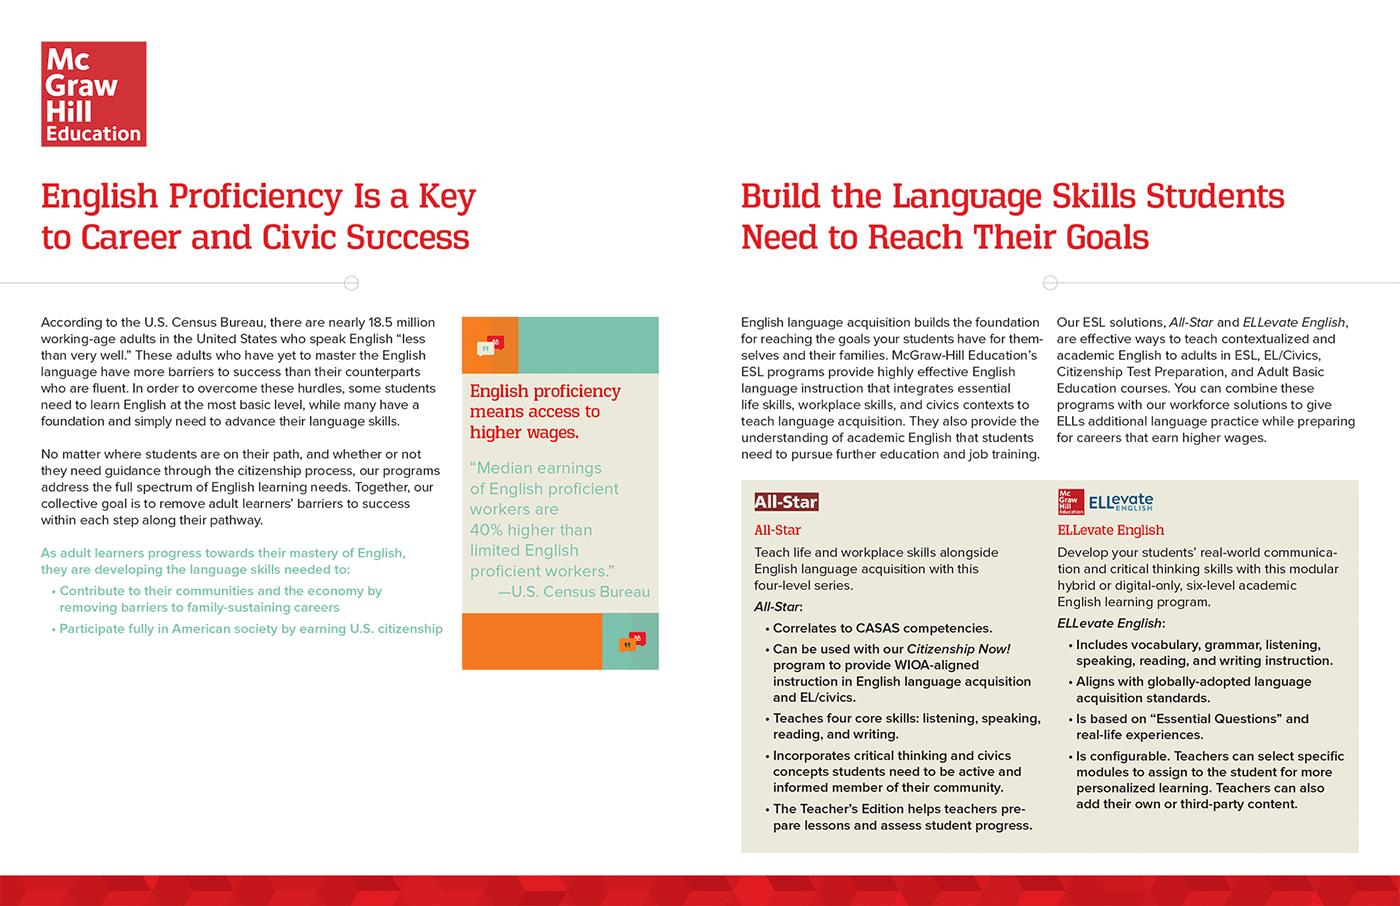 Mcgraw hill education esl programs ebook on behance mcgraw hill education english as a second language ebook fandeluxe Images